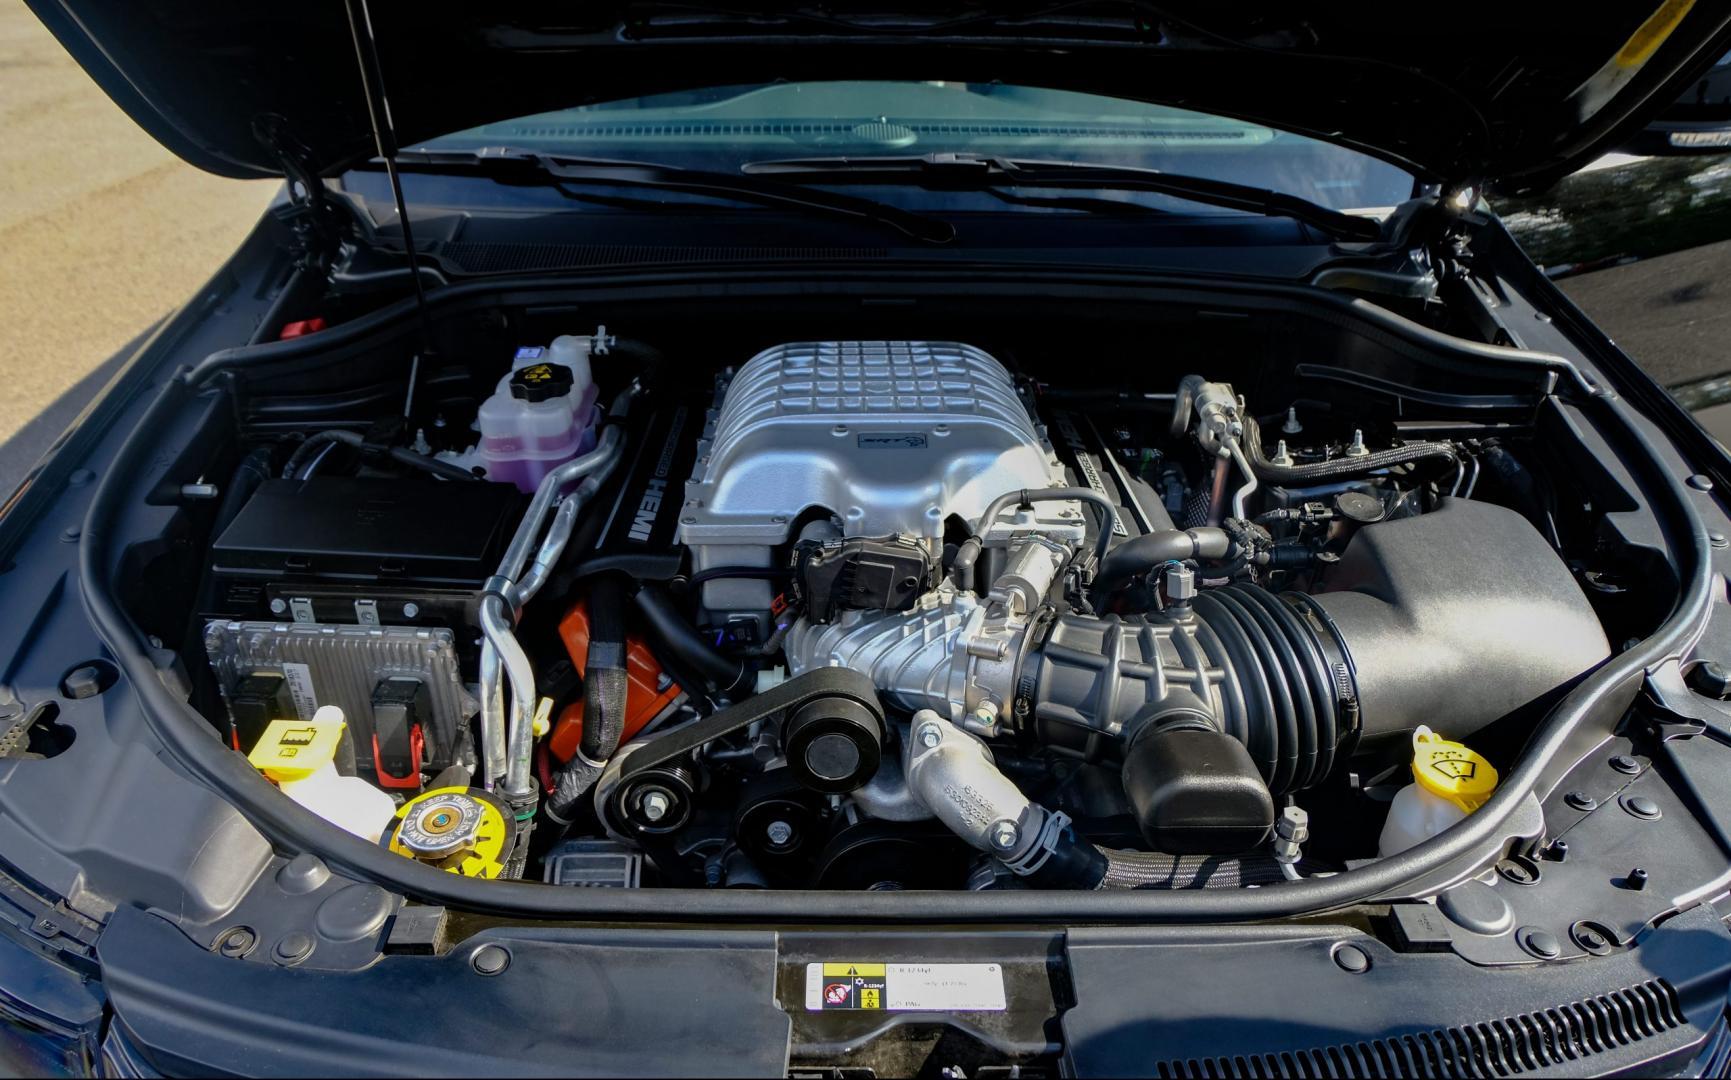 Jeep Trackhawk Manhart GC 800 motor